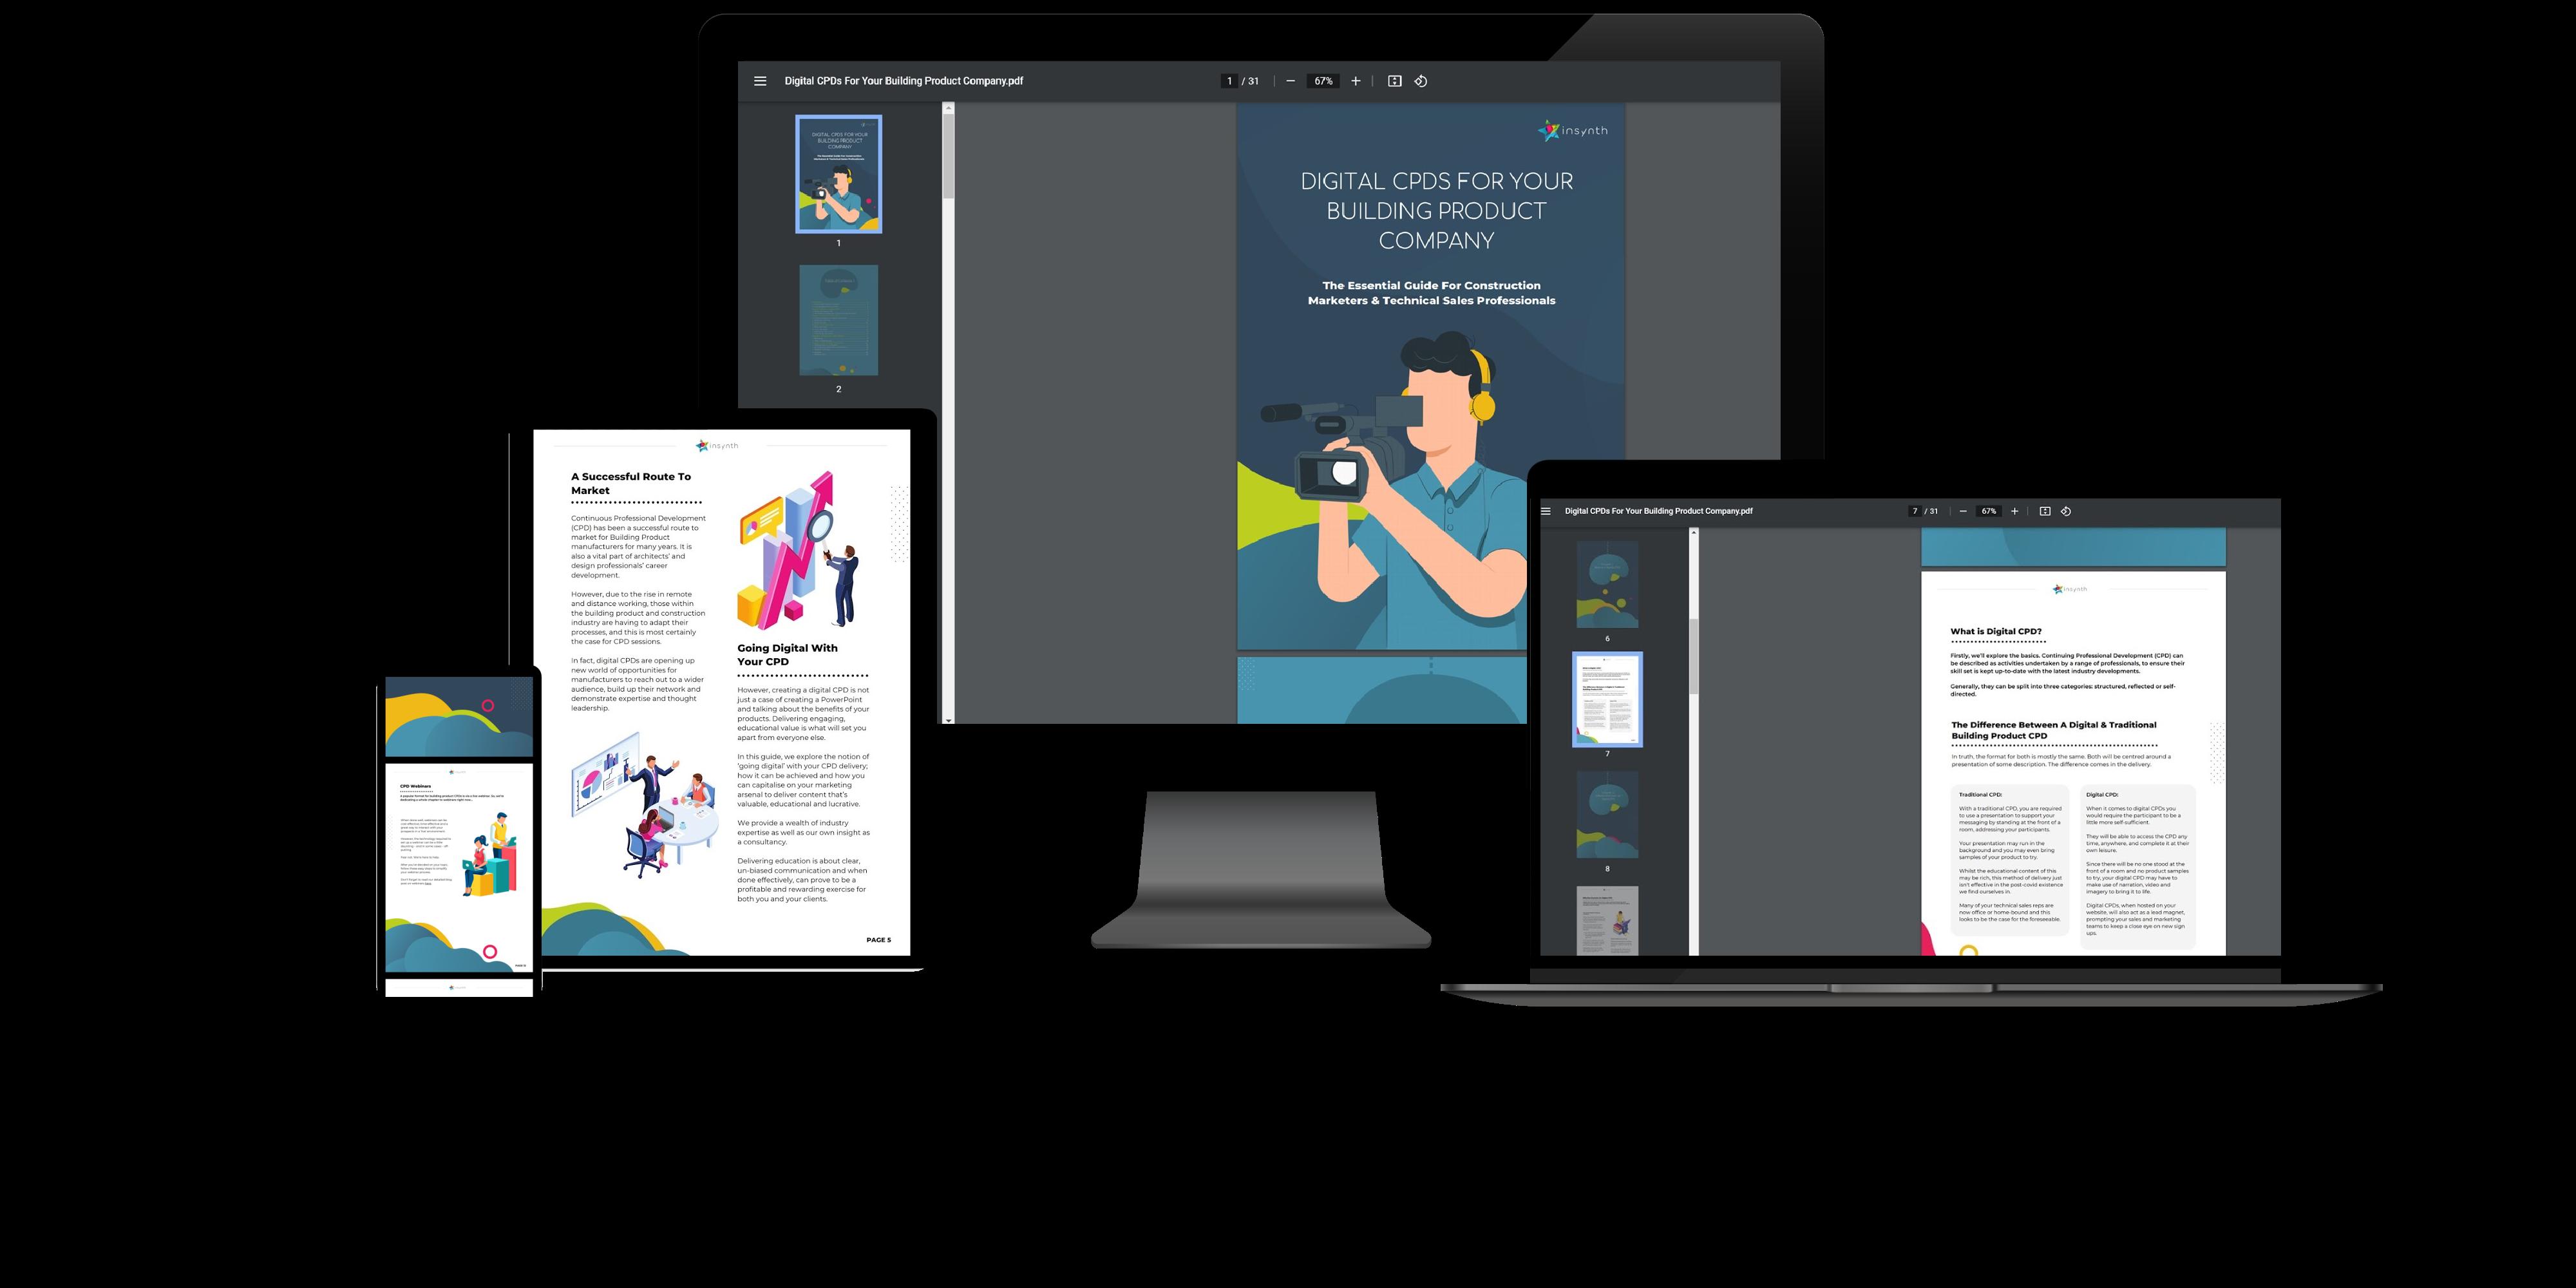 construction-marketing-webiste-SEO-optimisation-construction-web-design-specifiers-lead-gen-content-marketing-ebook-marketing-automation